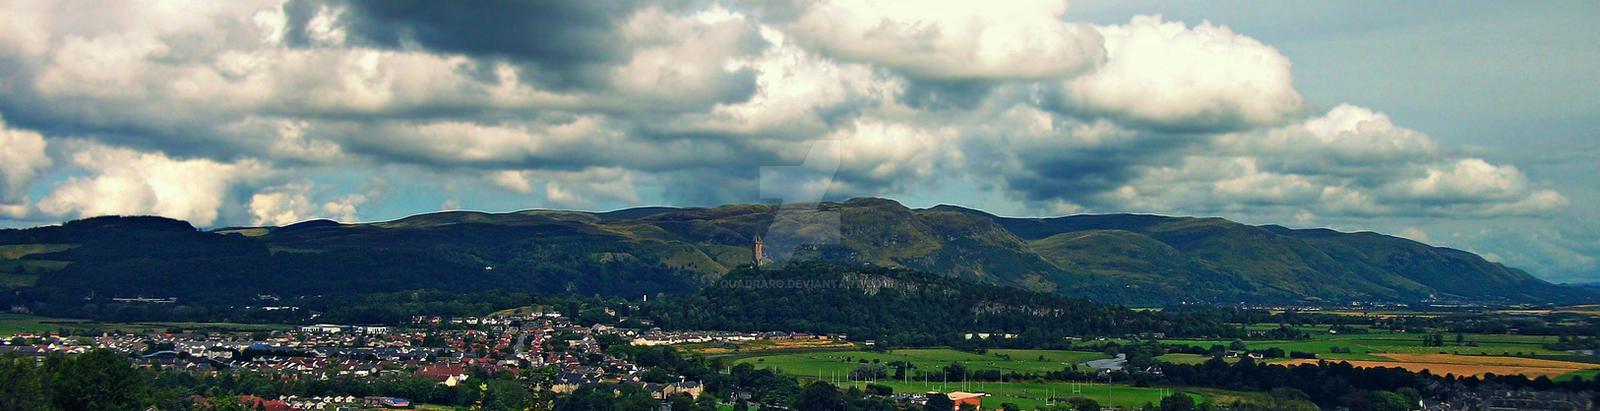 Stirling by Quadraro